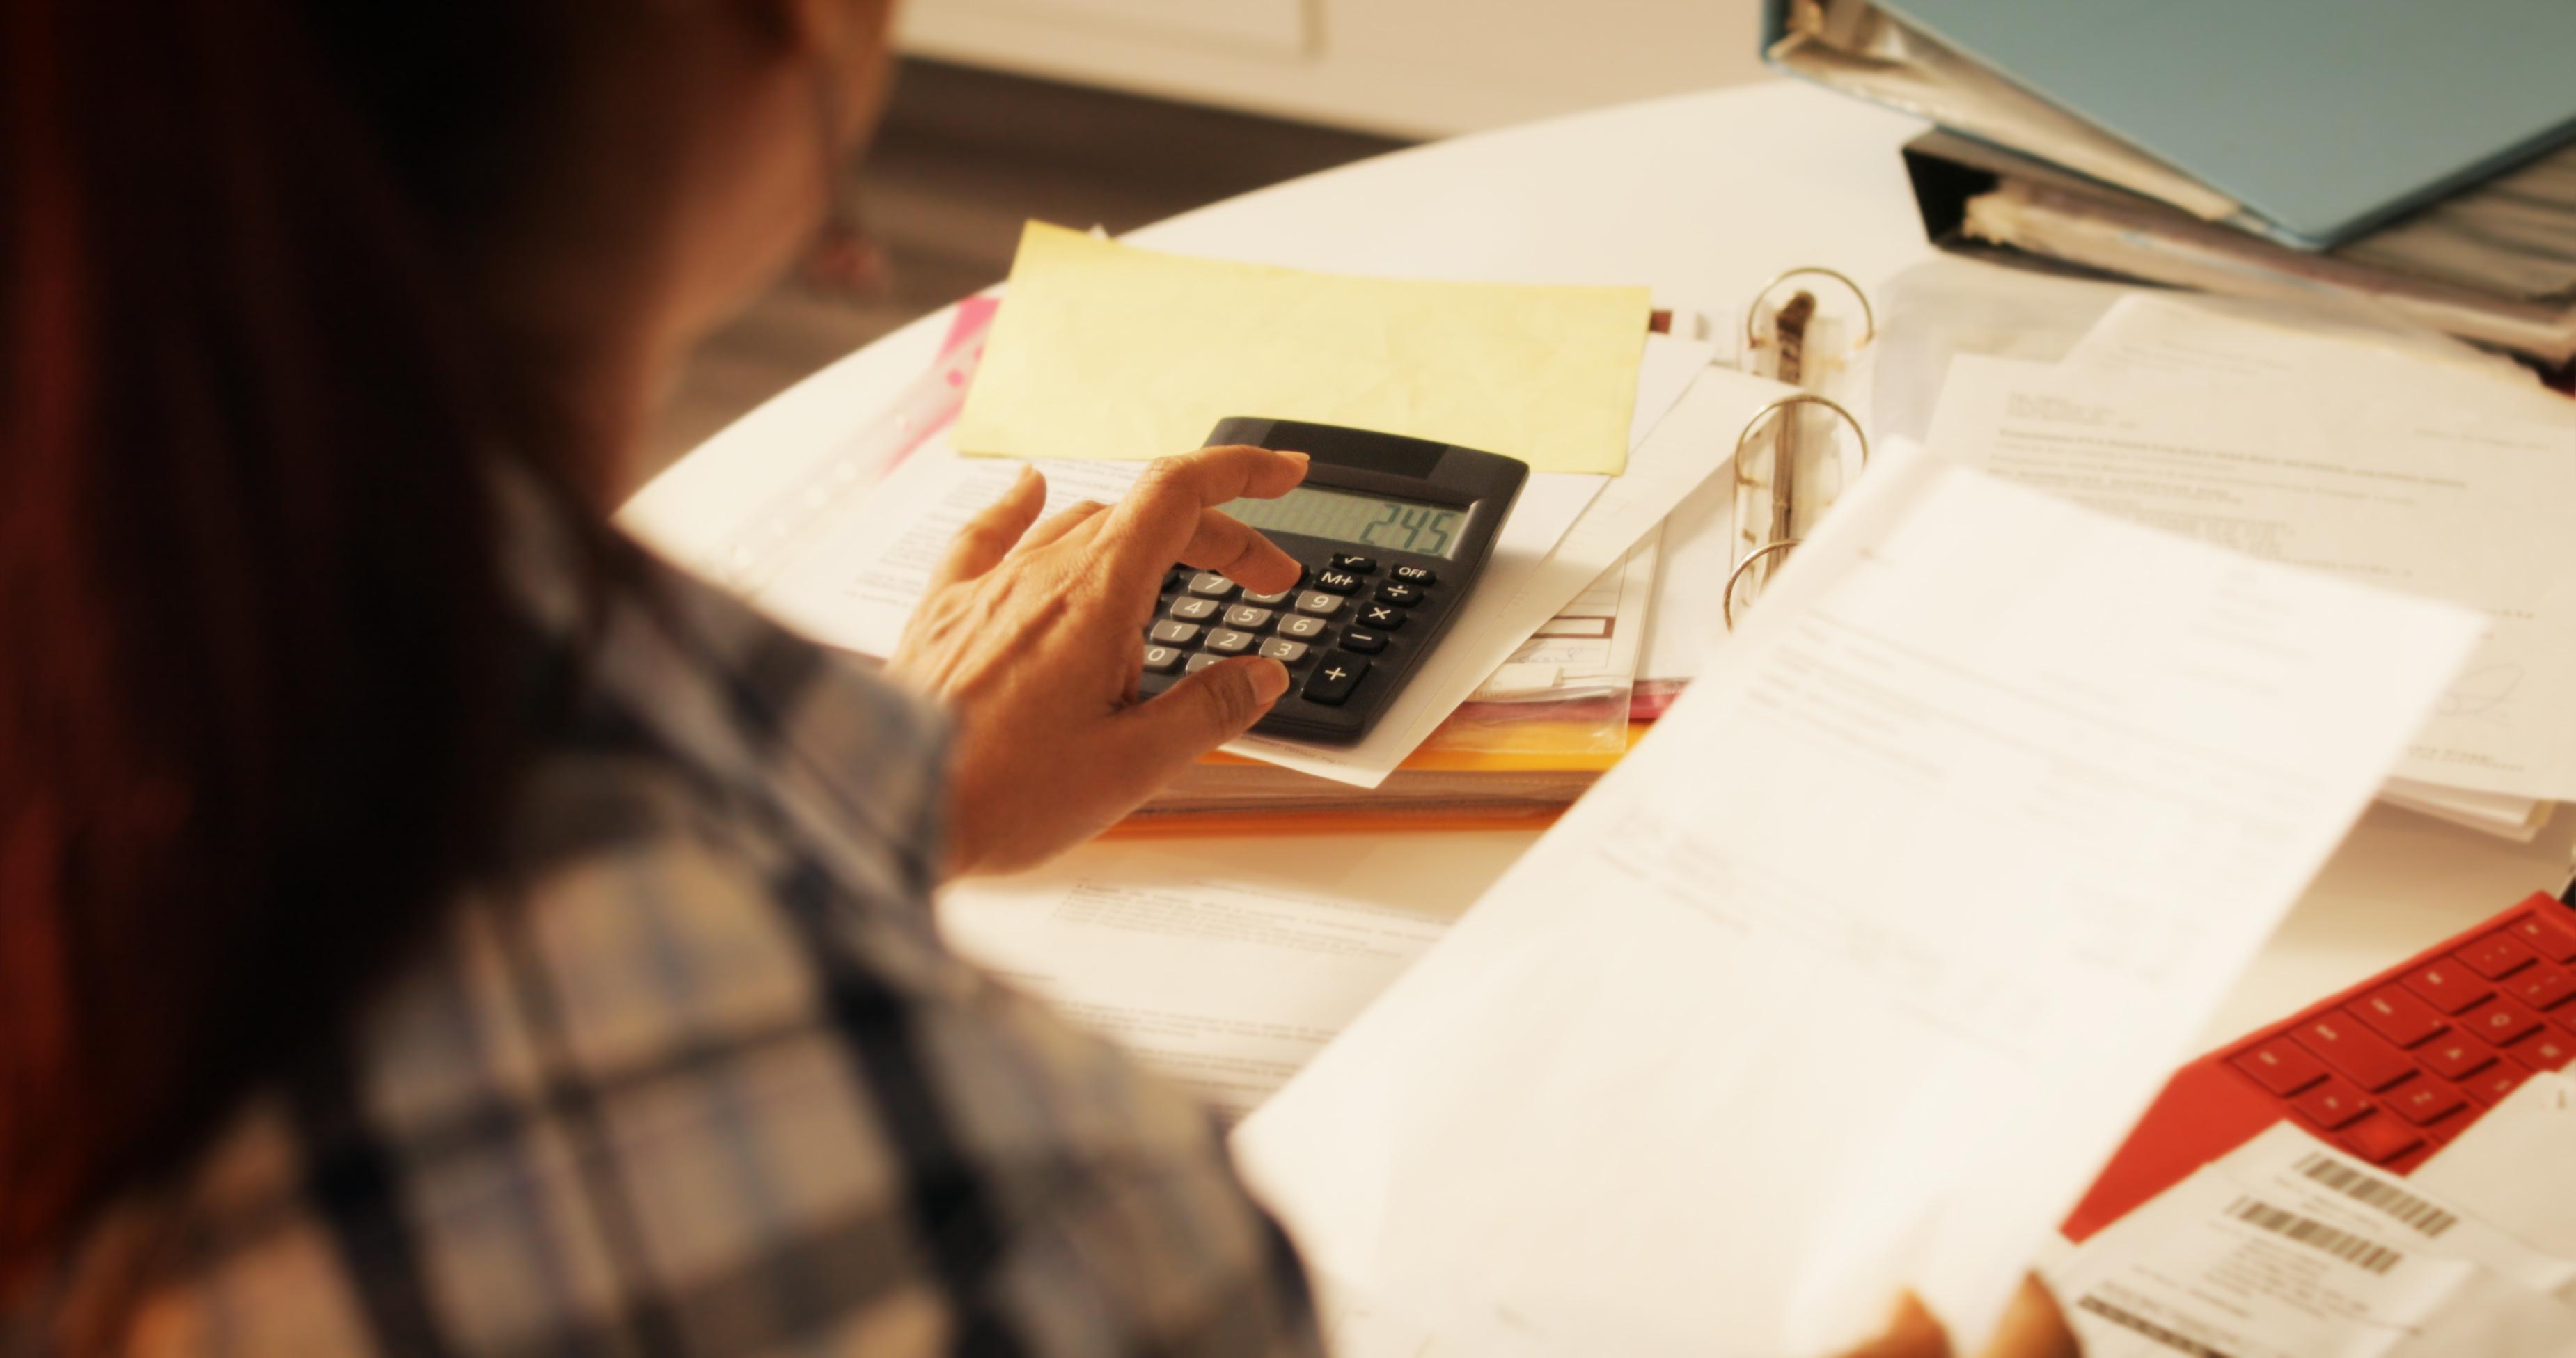 How to Set Up an IRS Payment Plan - NerdWallet